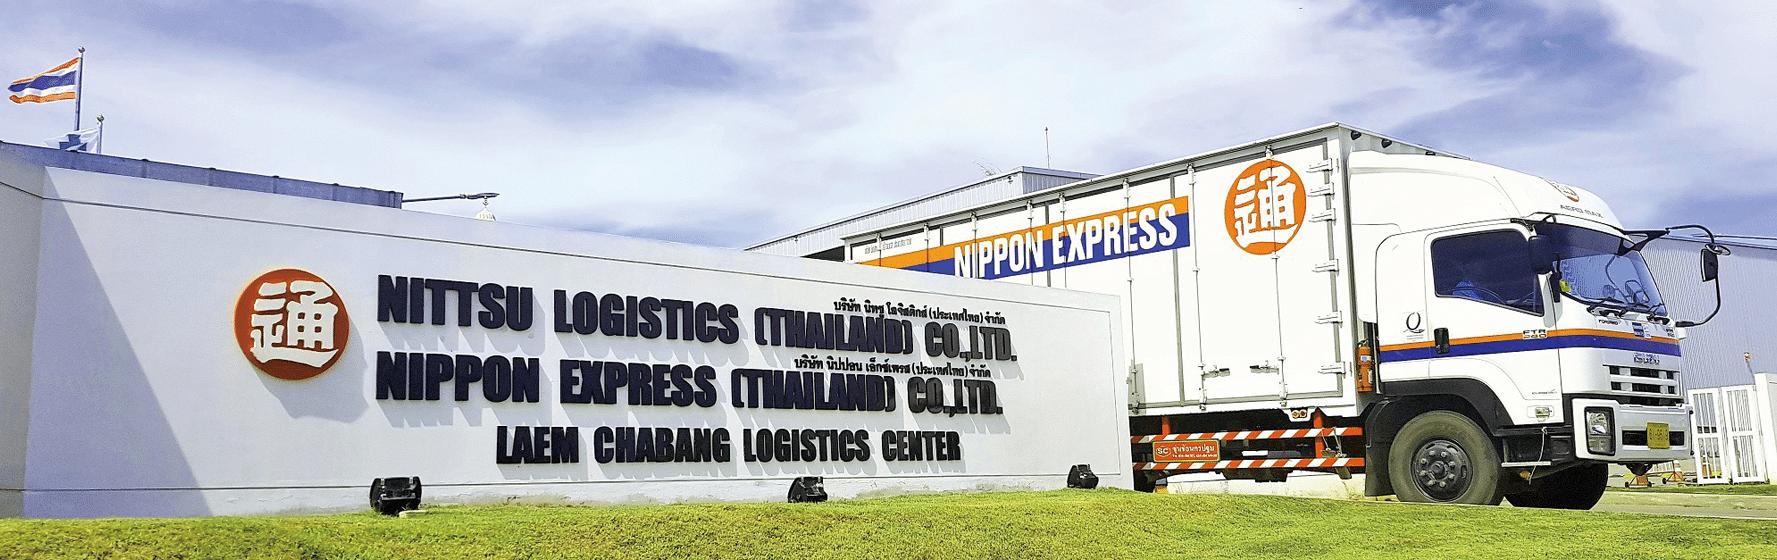 NIPPON EXPRESS GROUP - 企業検索 - ワイズデジタル【タイで働く人のための情報サイト】